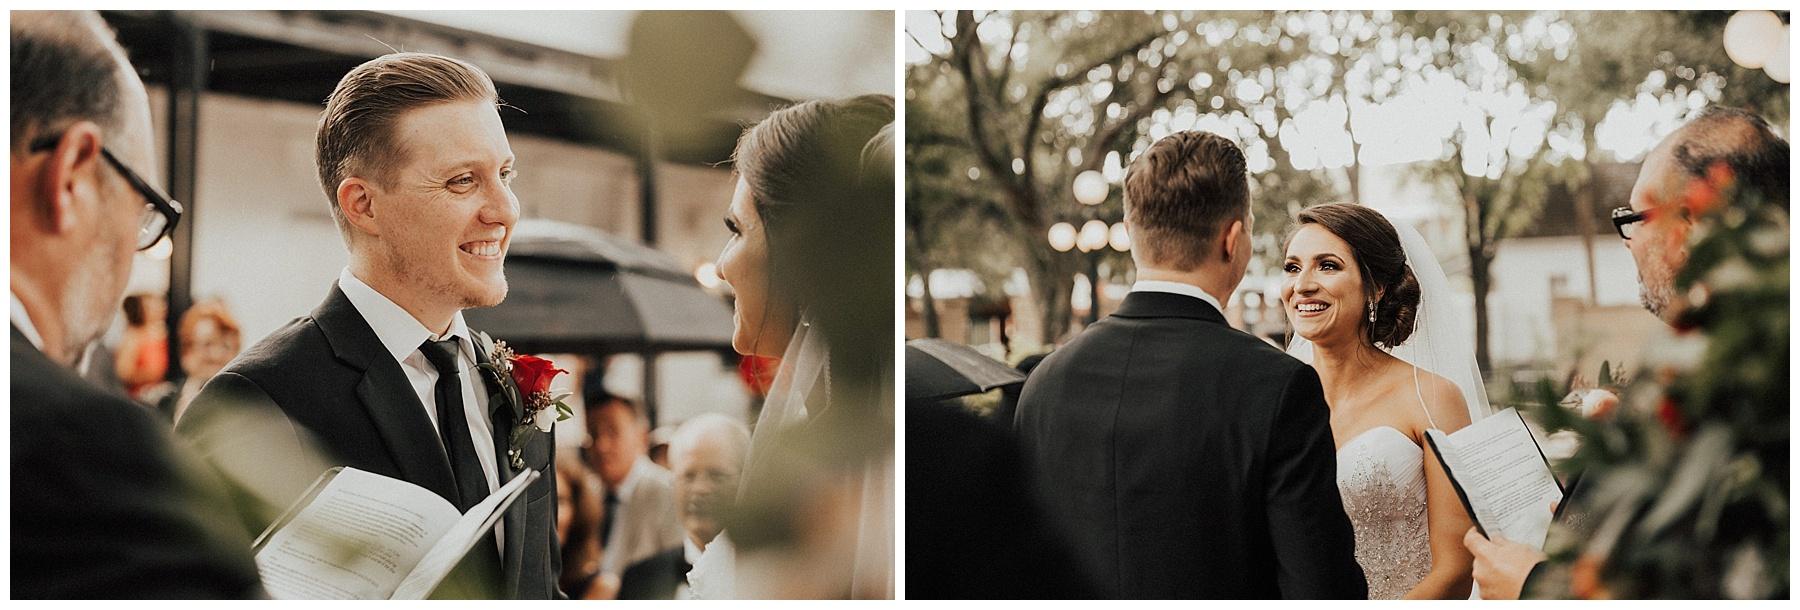 YBOR Wedding Tampa Wedding Photographer-75.jpg